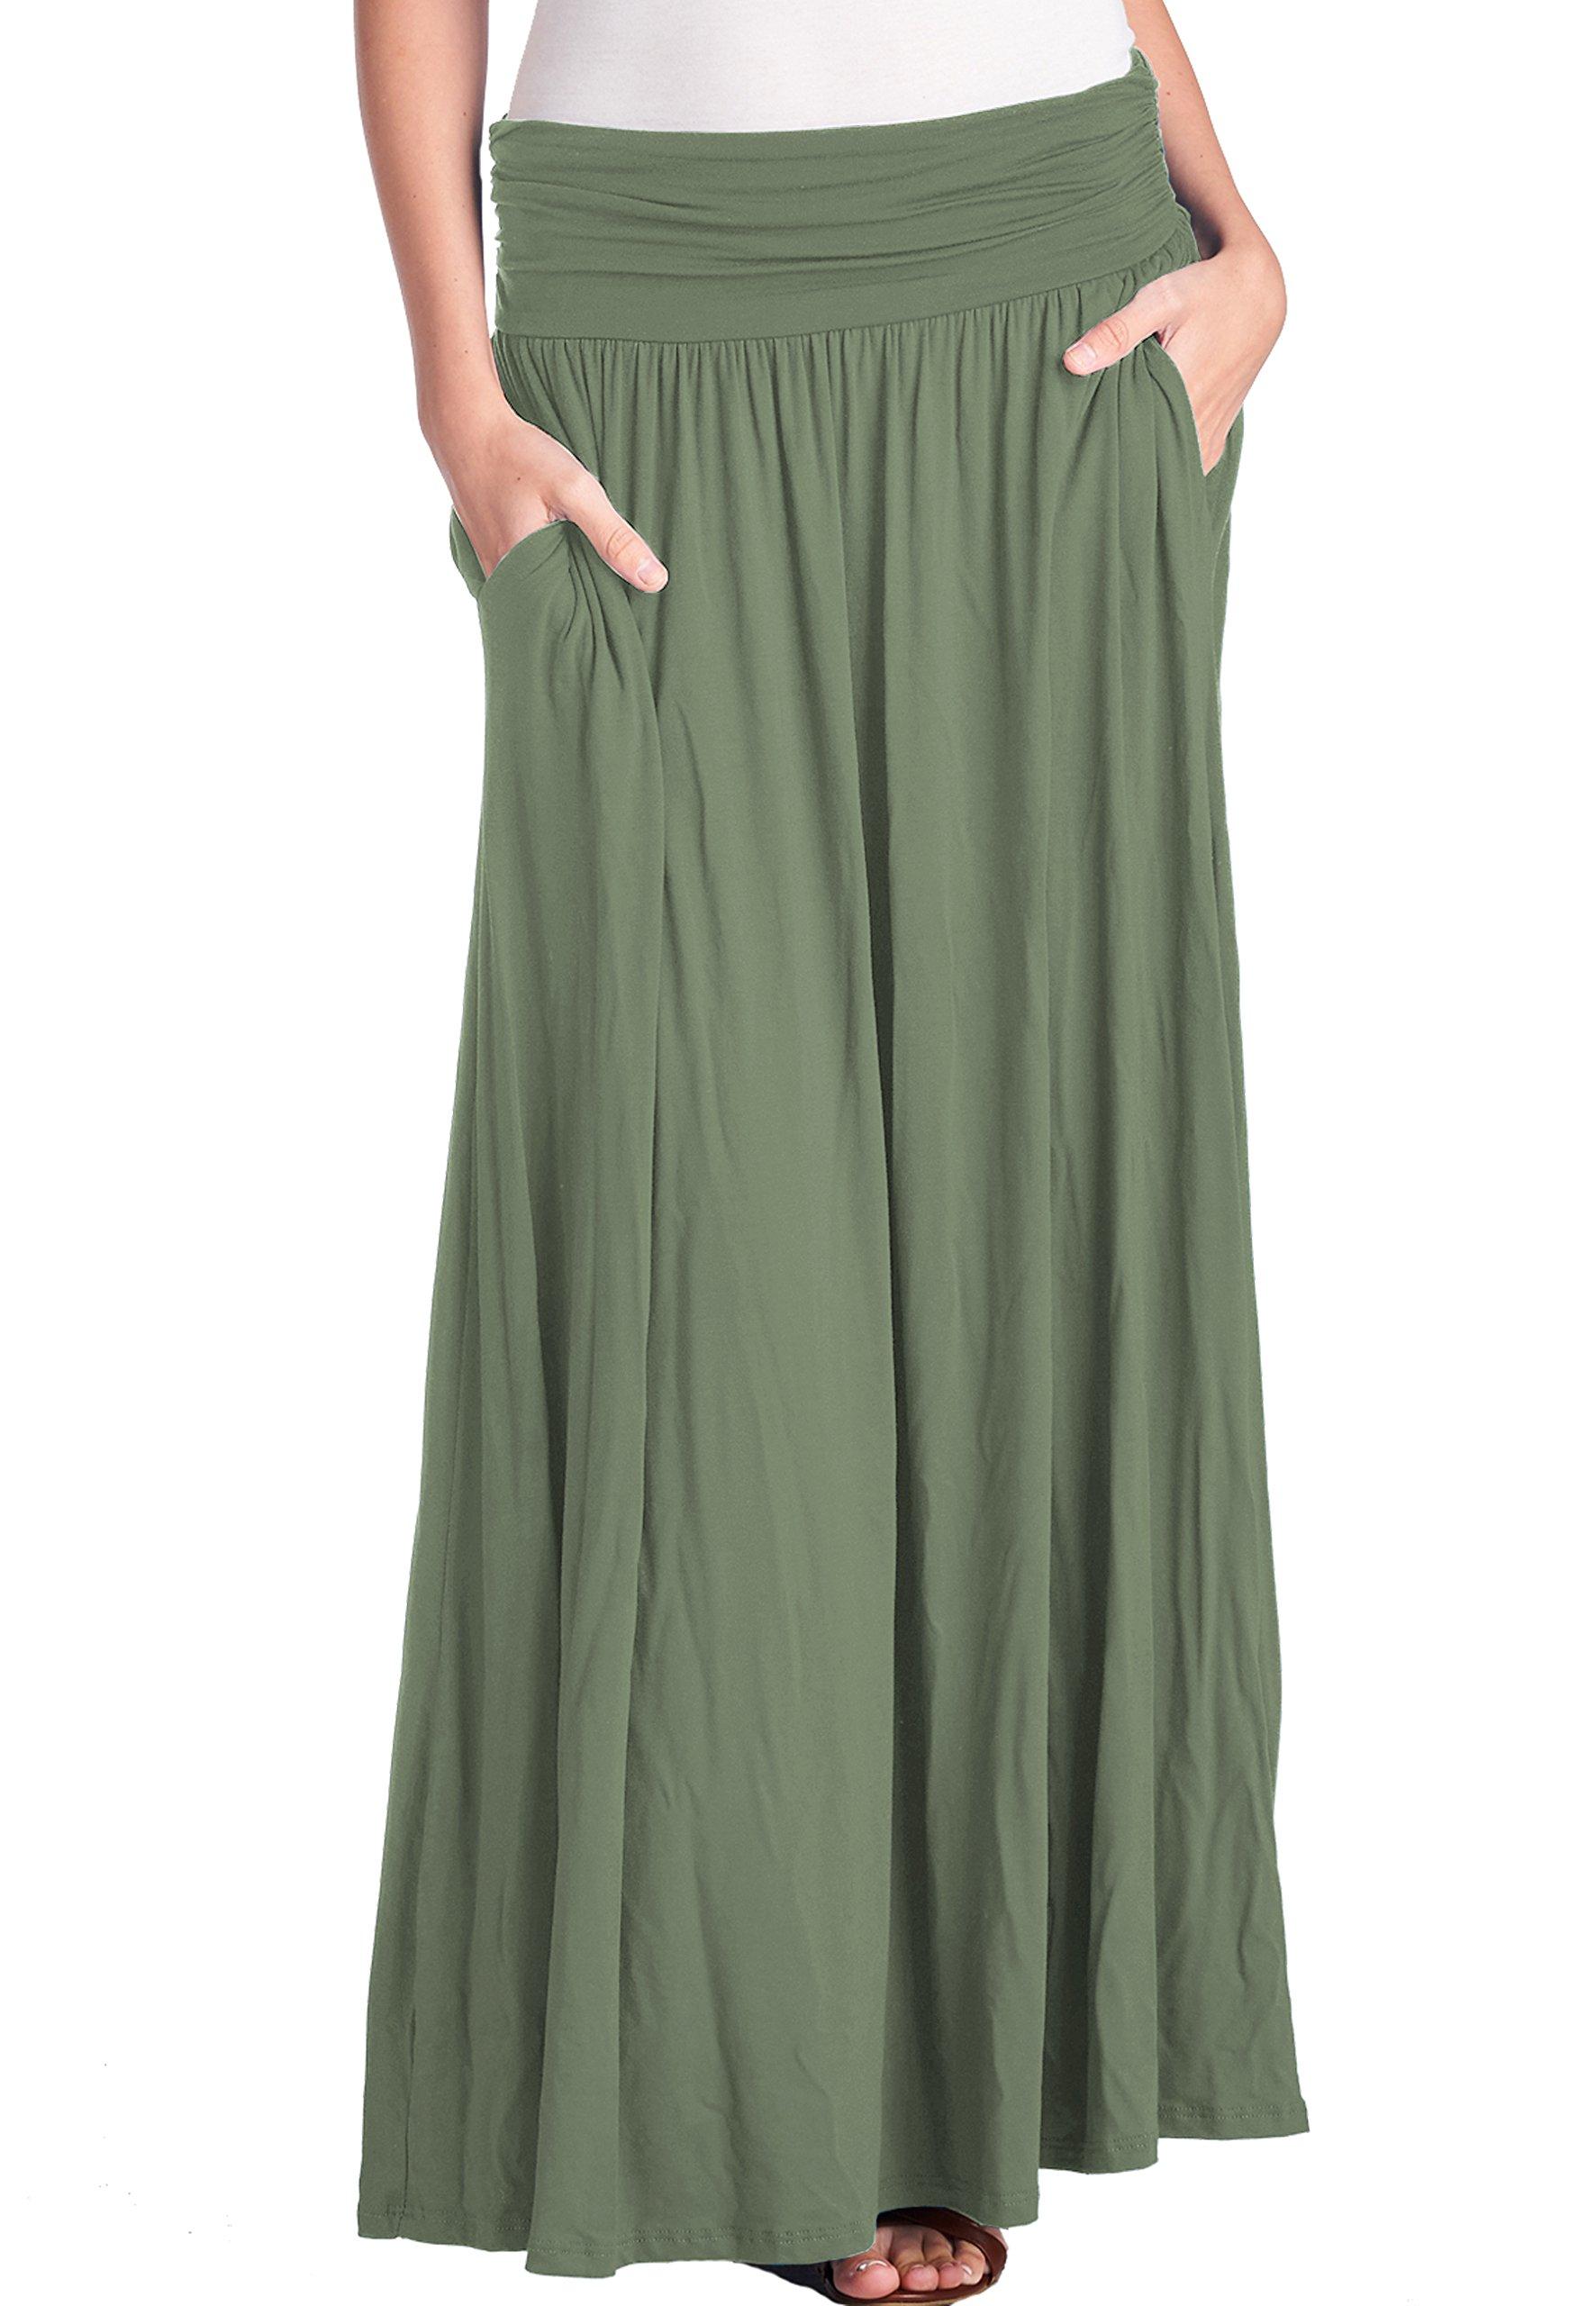 f2b39bfbbc1b42 Galleon - TRENDY UNITED Women's High Waist Fold Over Shirring Maxi Skirt  With Pockets,Dusty Green-Maxi,XX-Large